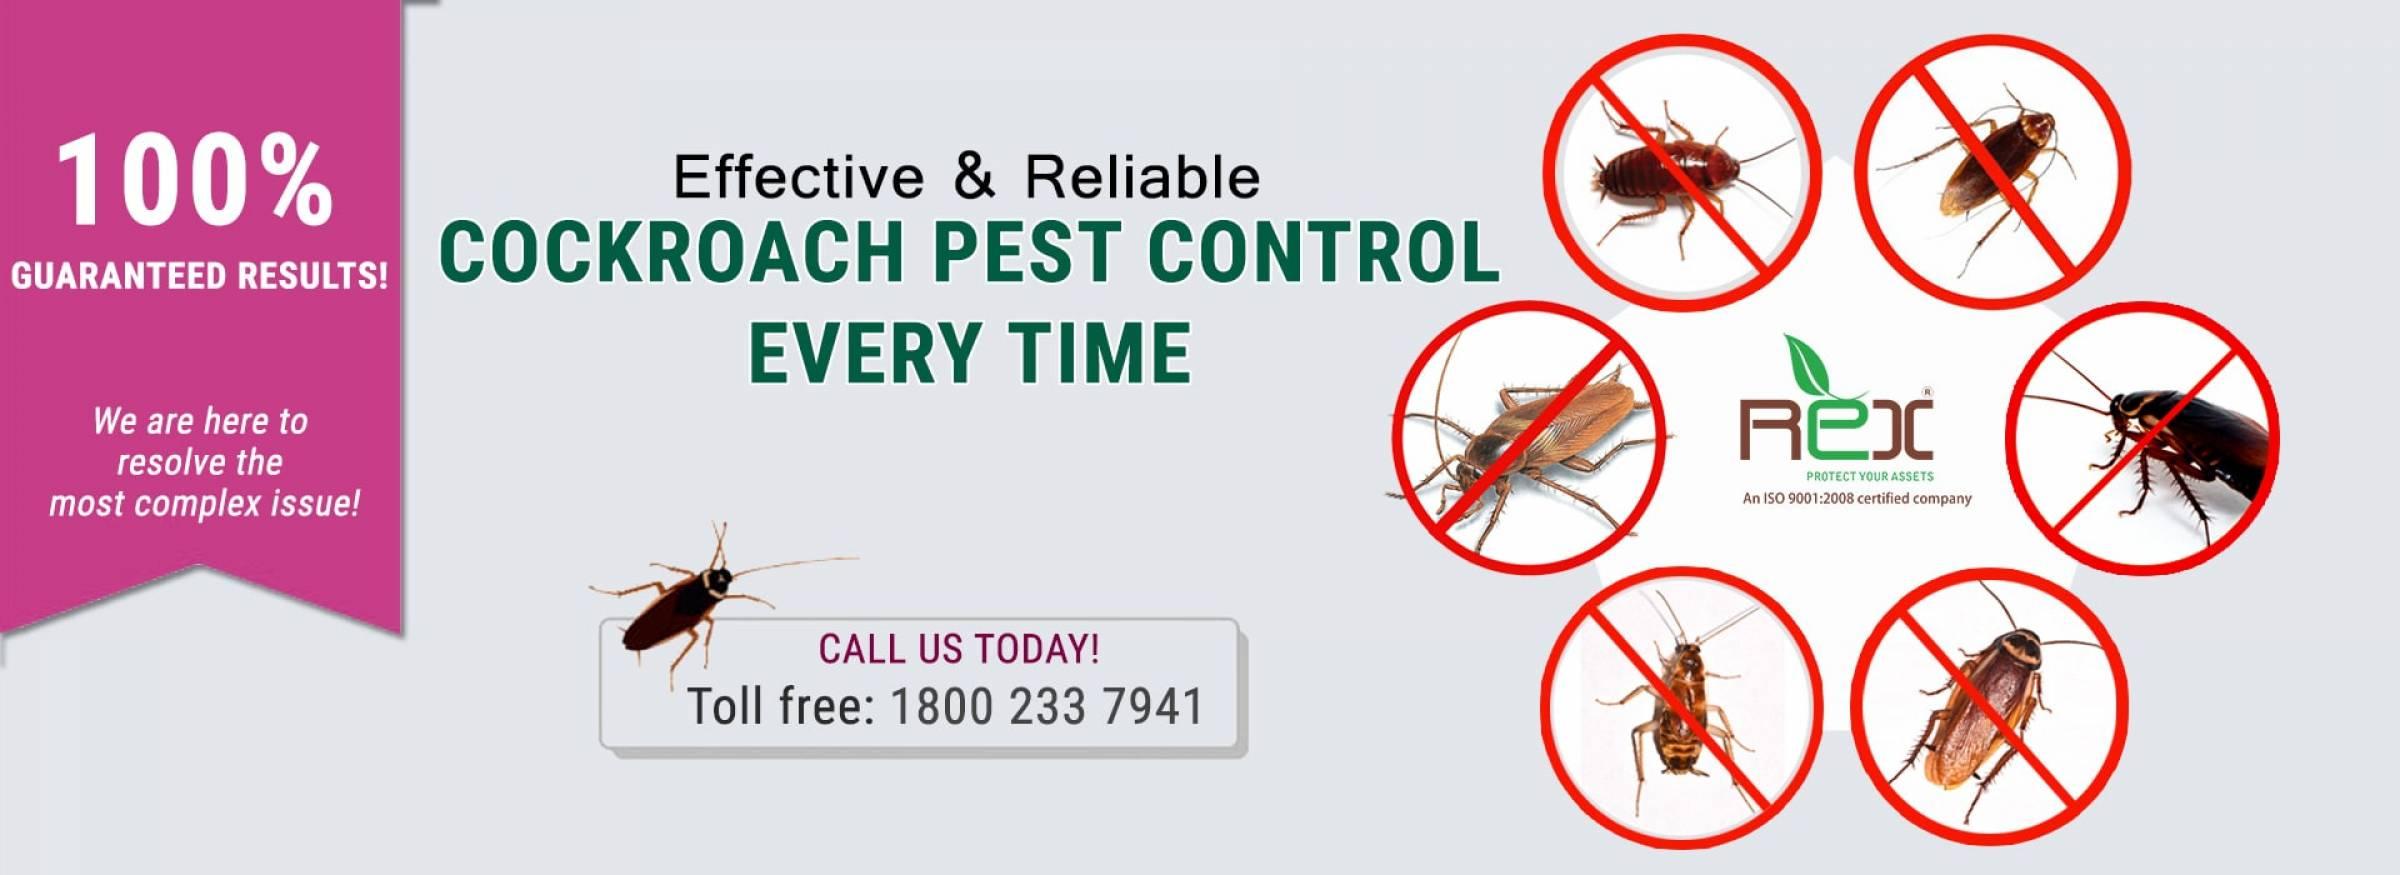 Best Cockroaches Pest Control Services